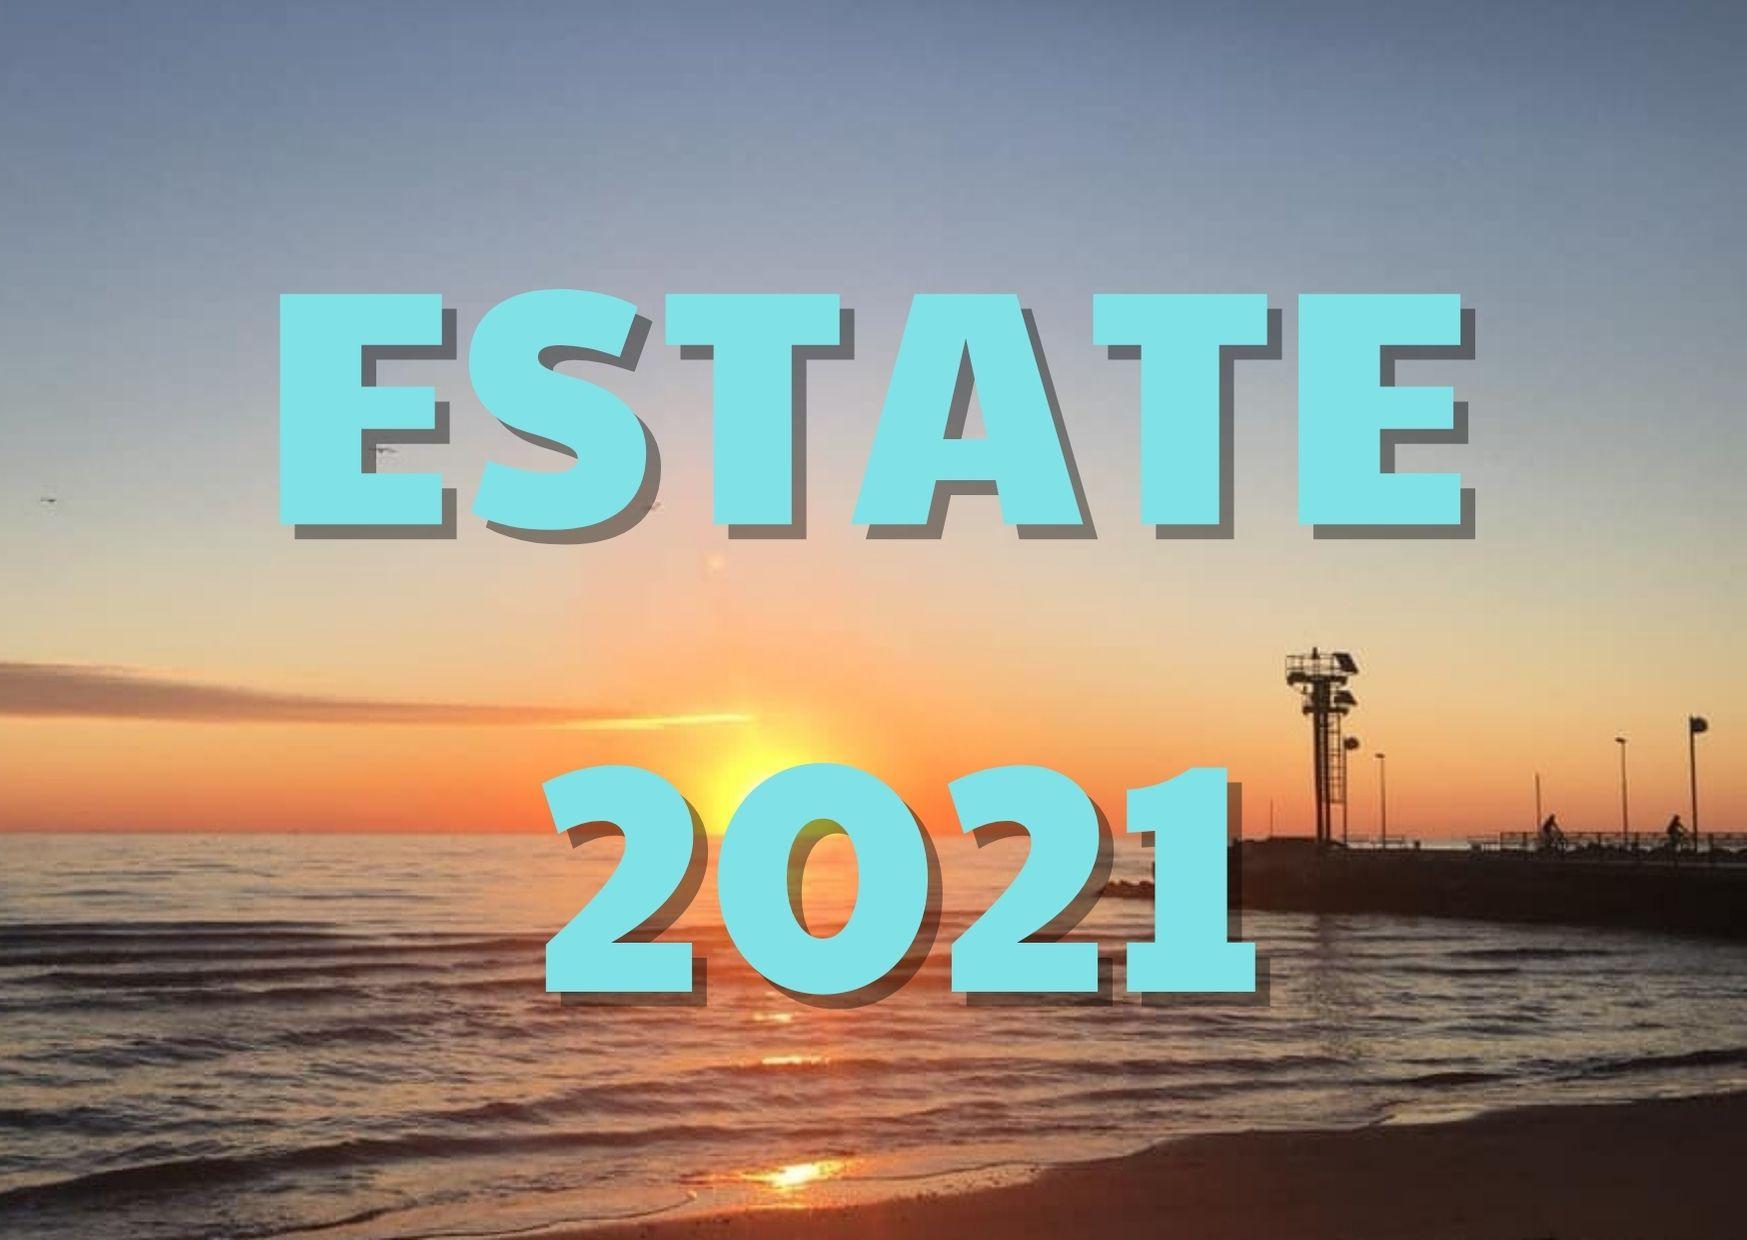 Estate 2021, le regole per spostarsi in libertà